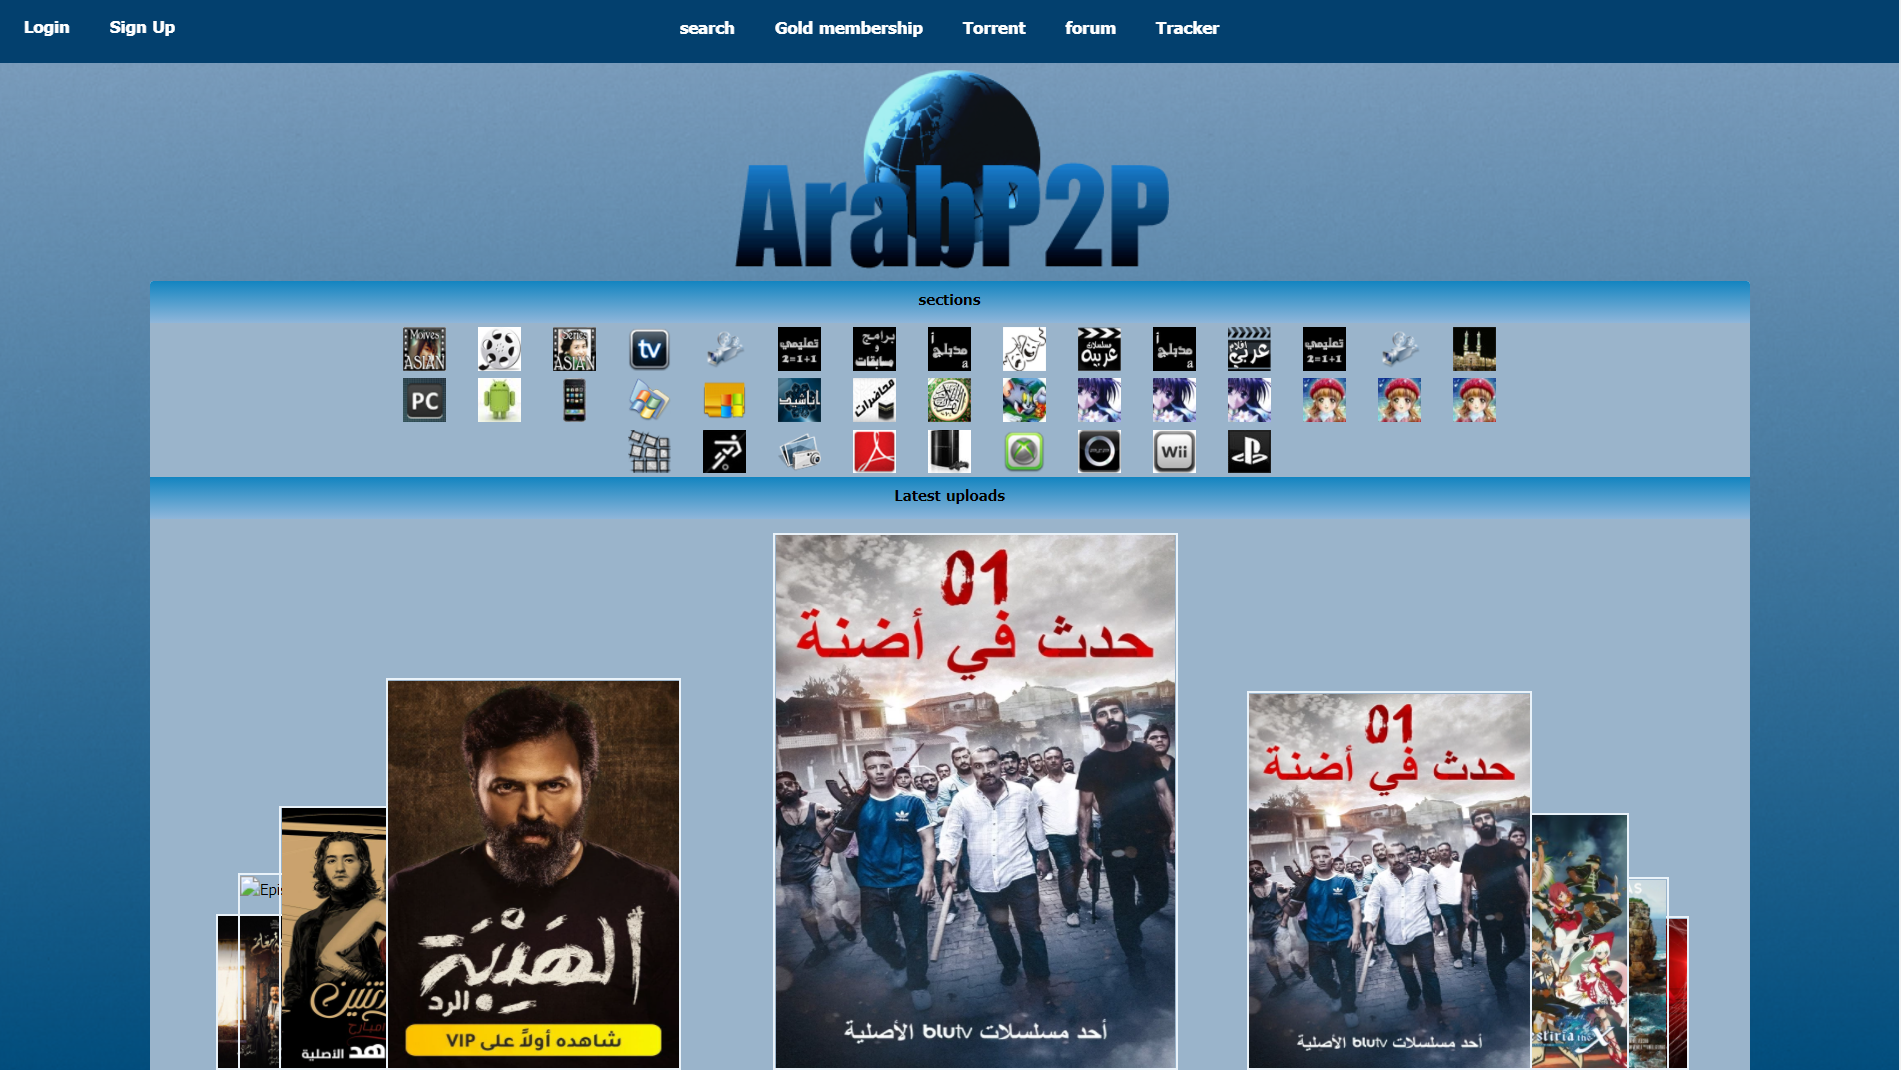 Arabp2p website image